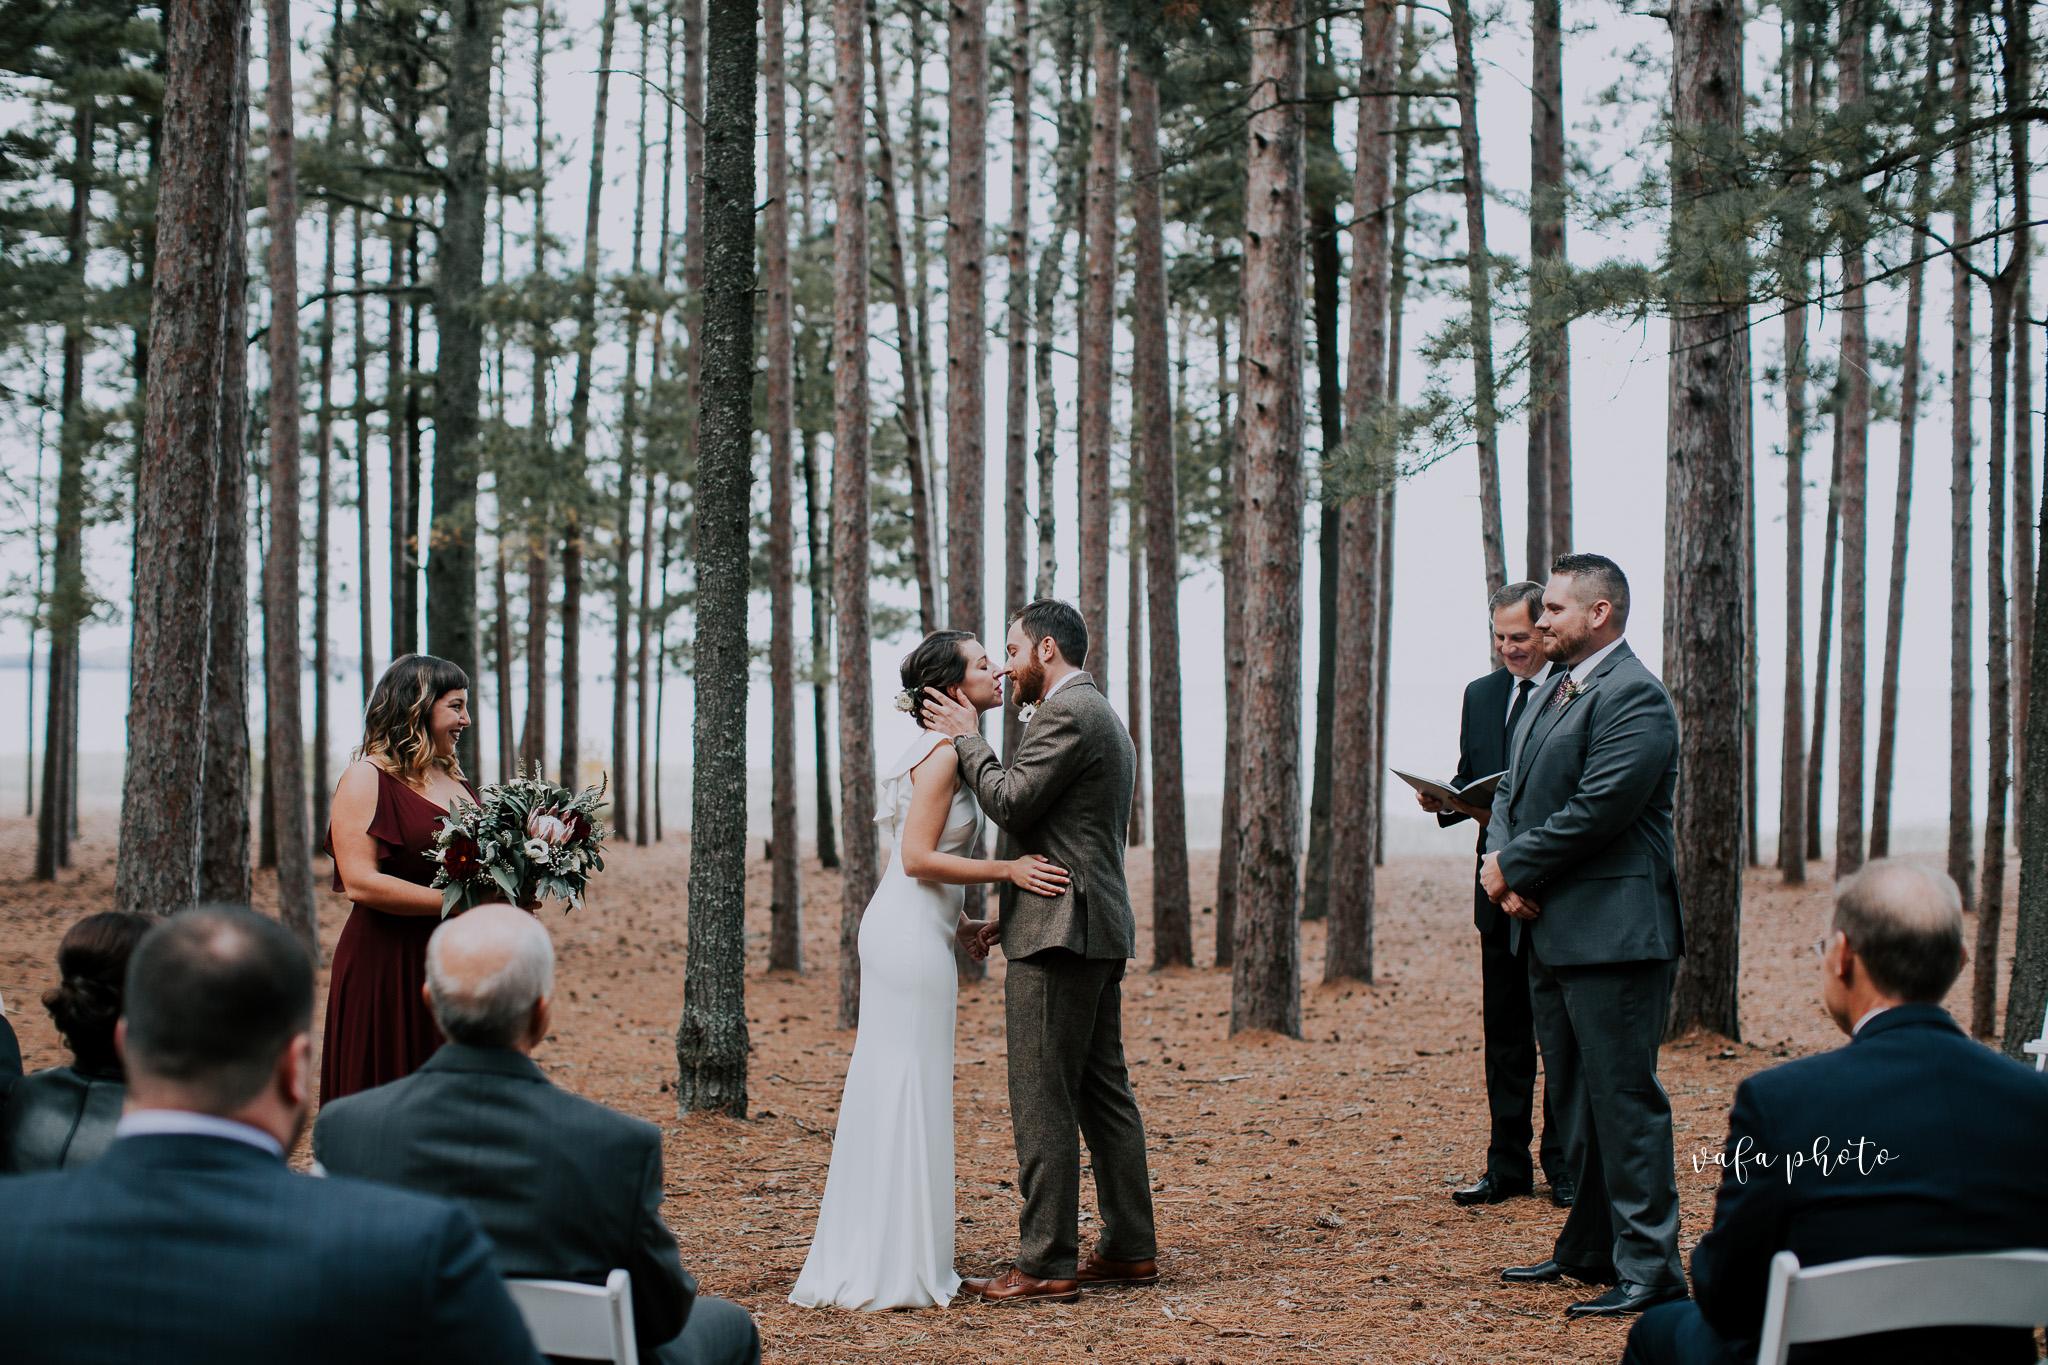 Little-Presque-Isle-Michigan-Wedding-Kim-Kyle-Vafa-Photo-255.jpg